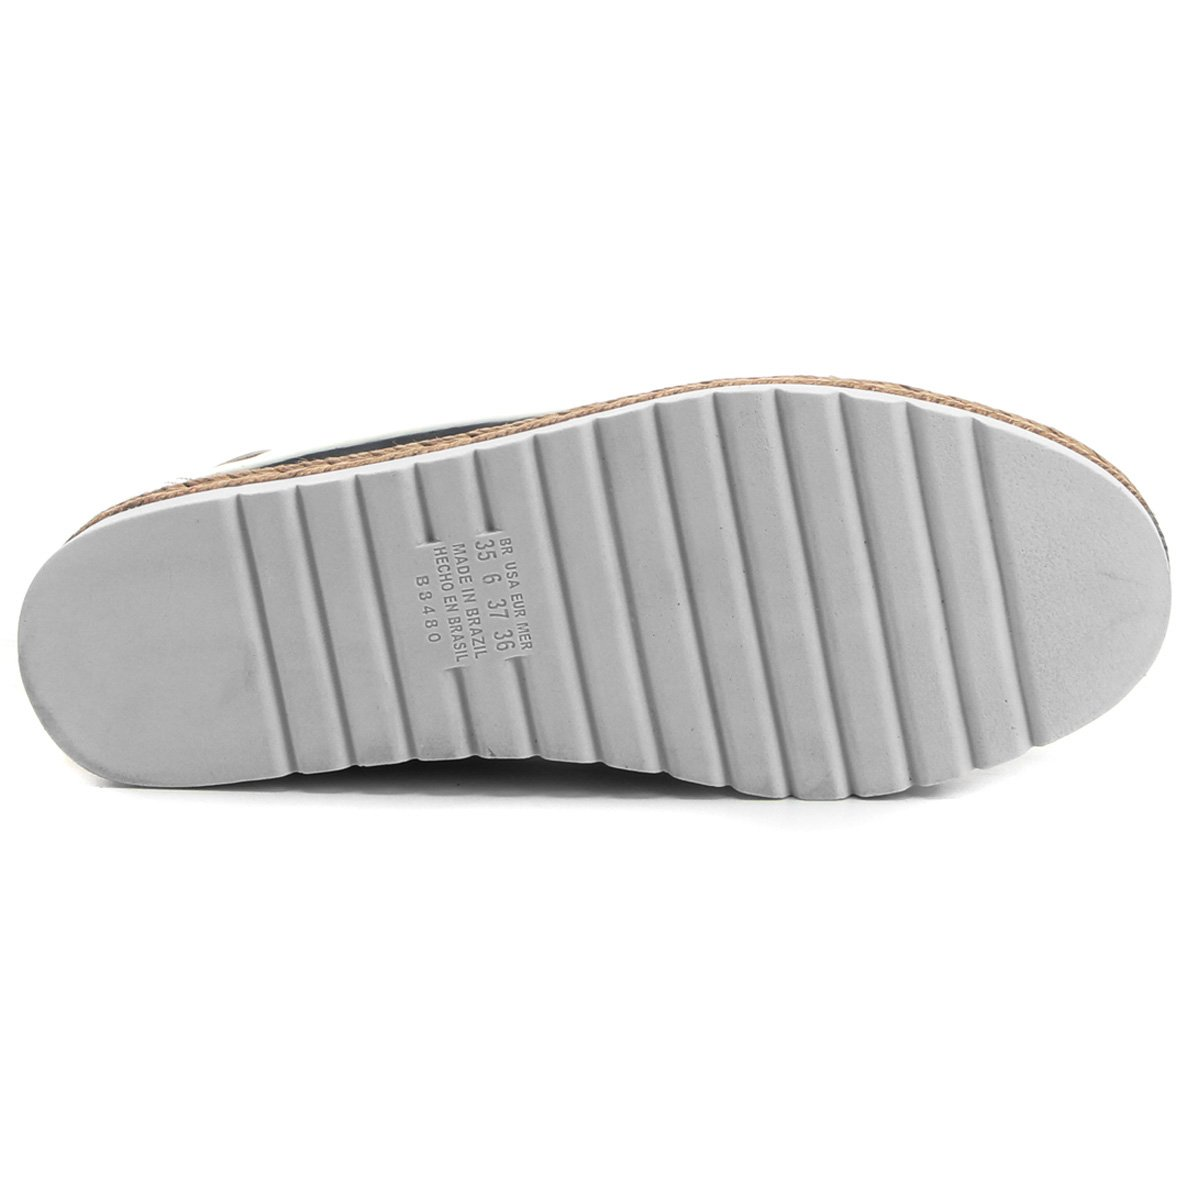 Tênis Corda Prata Dakota Tênis Tênis Solado Prata Solado Dakota Metalizado Dakota Metalizado Solado Corda qCZxZ8wp